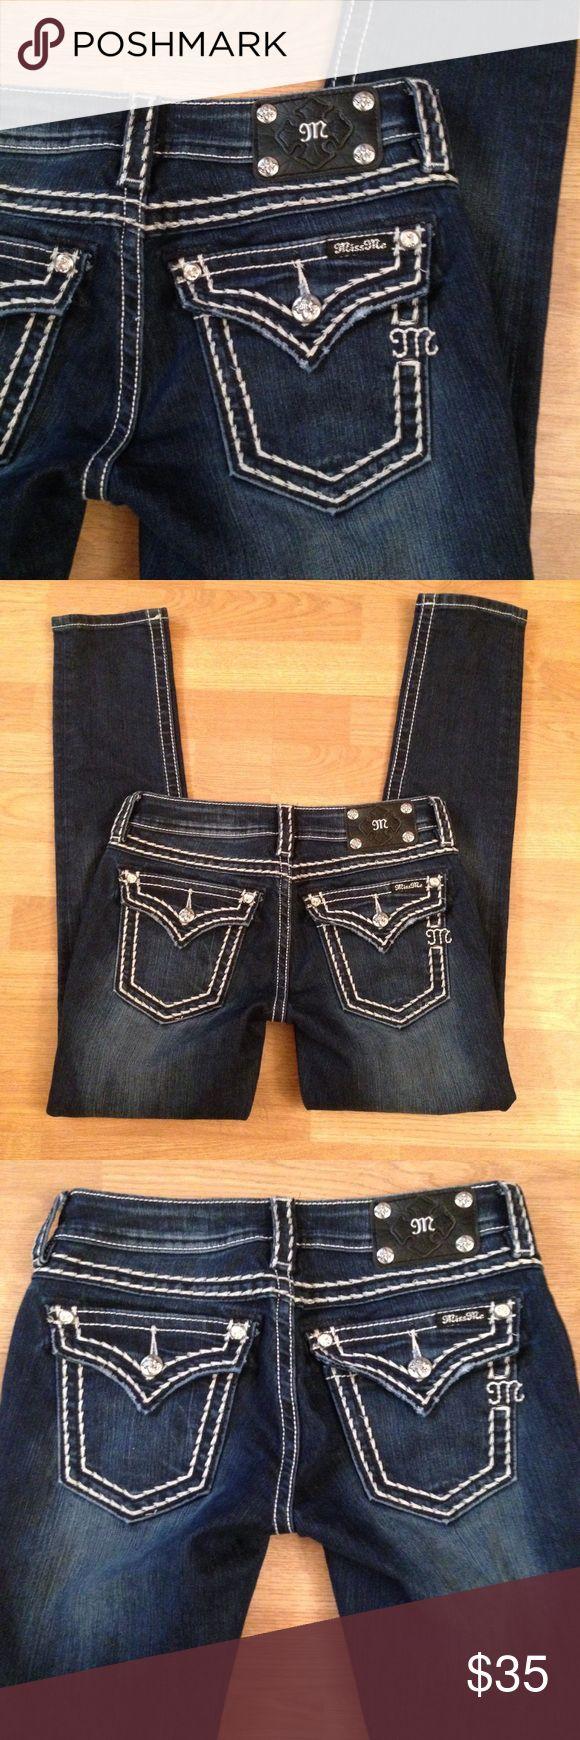 "NWOT Miss Me Skinny Jeans Miss Me Skinny Jeans NWOT Sz 28x31"" Miss Me Jeans Skinny"